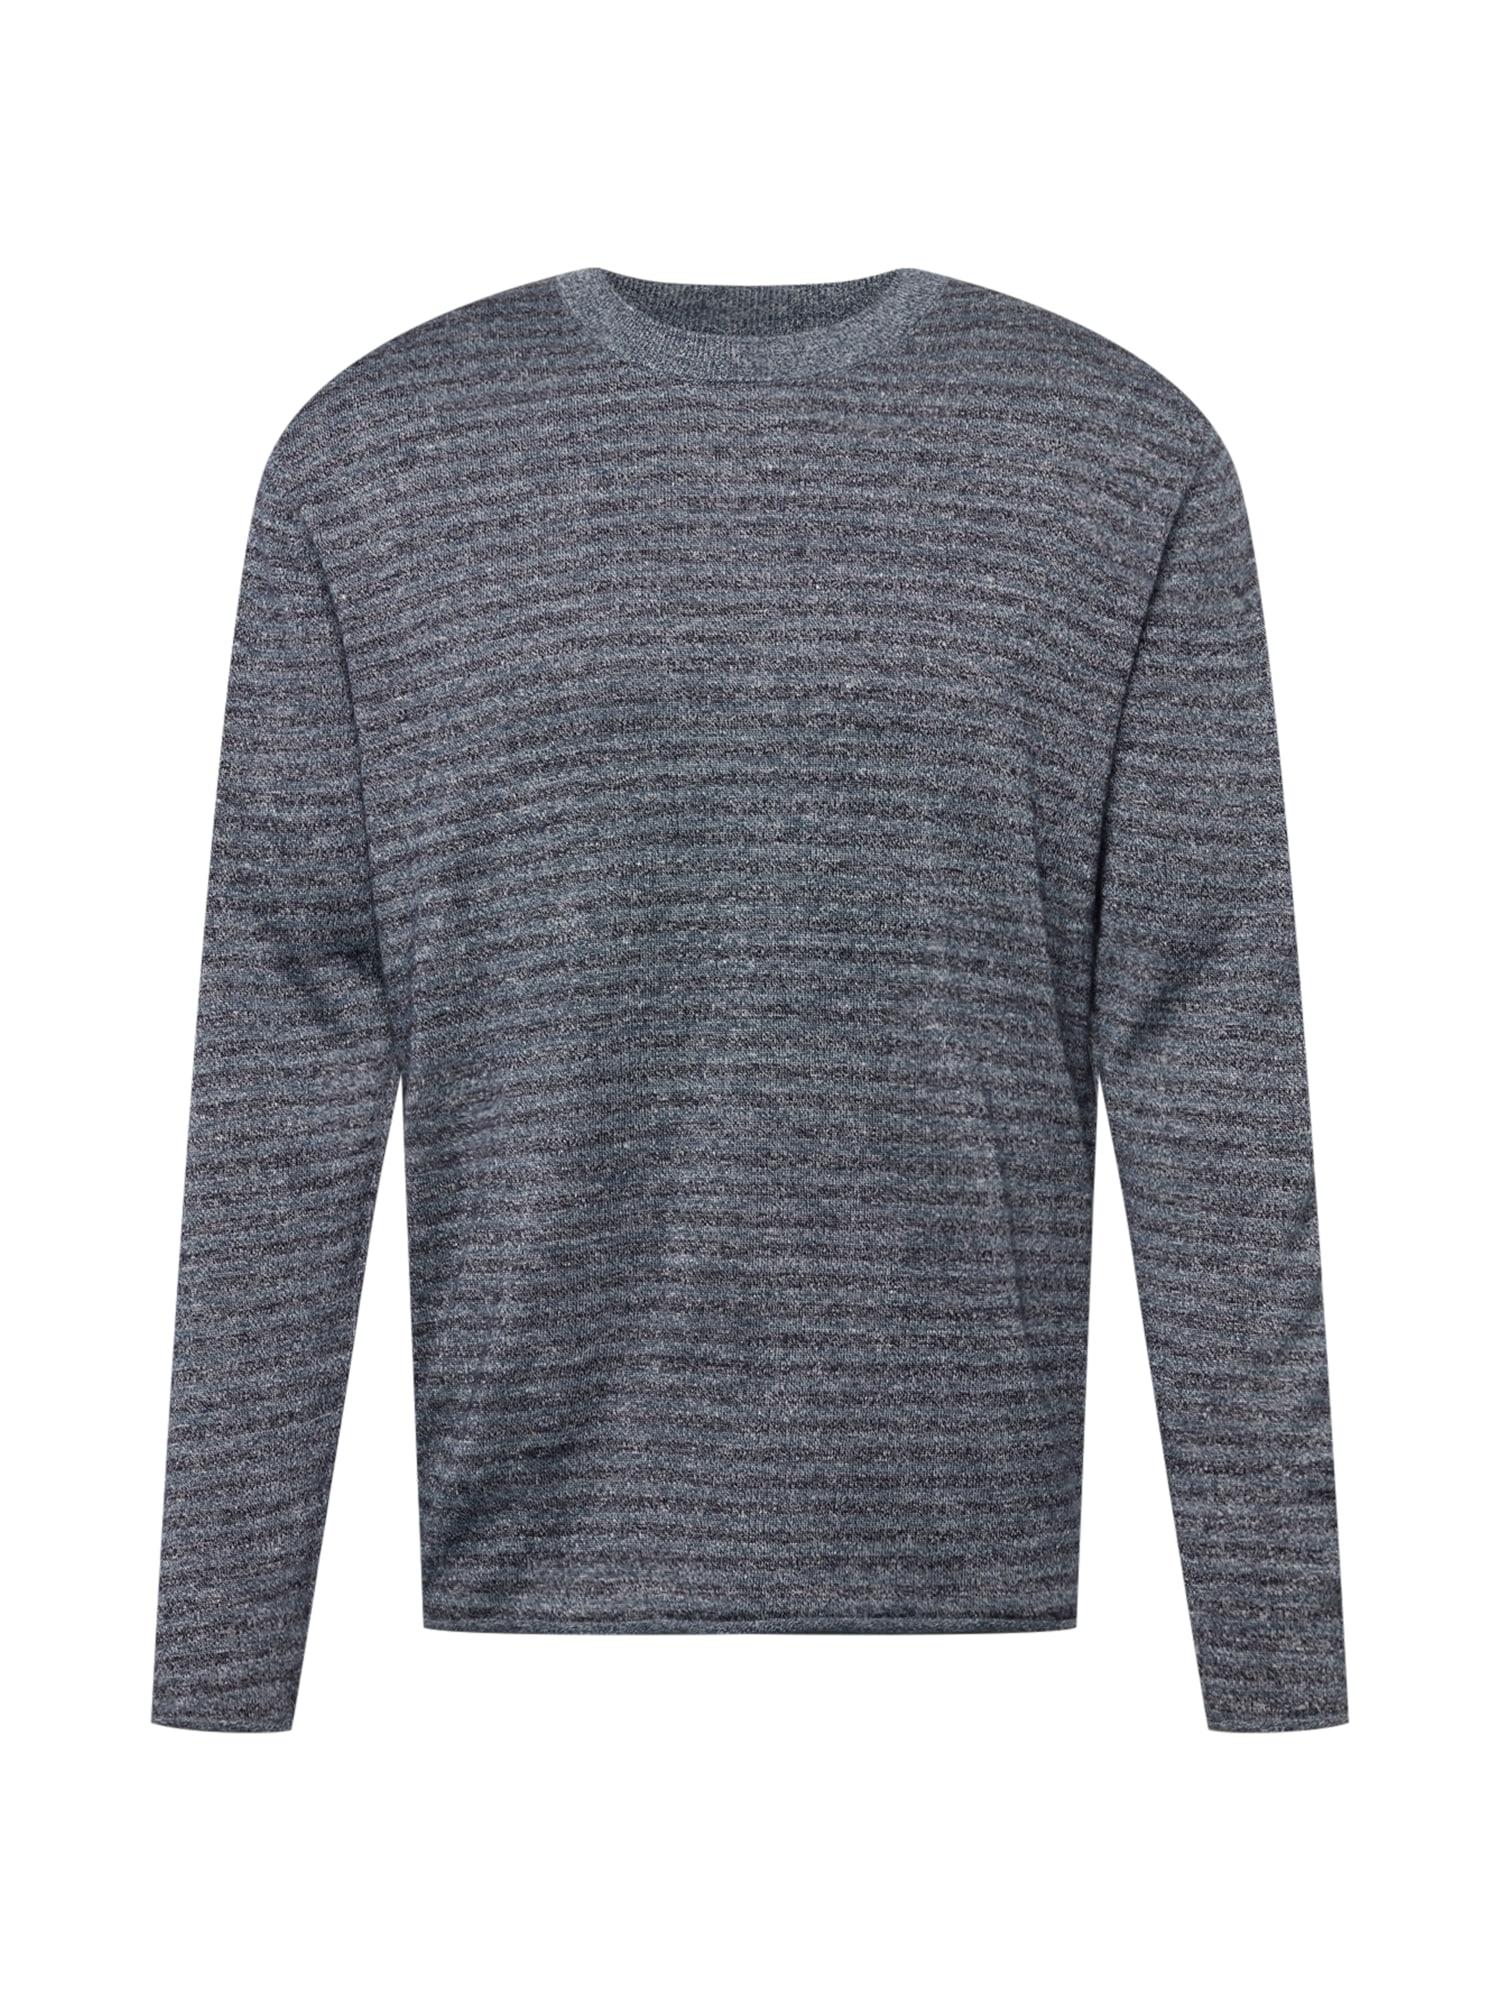 ICEBREAKER Sportinis megztinis margai mėlyna / tamsiai mėlyna jūros spalva